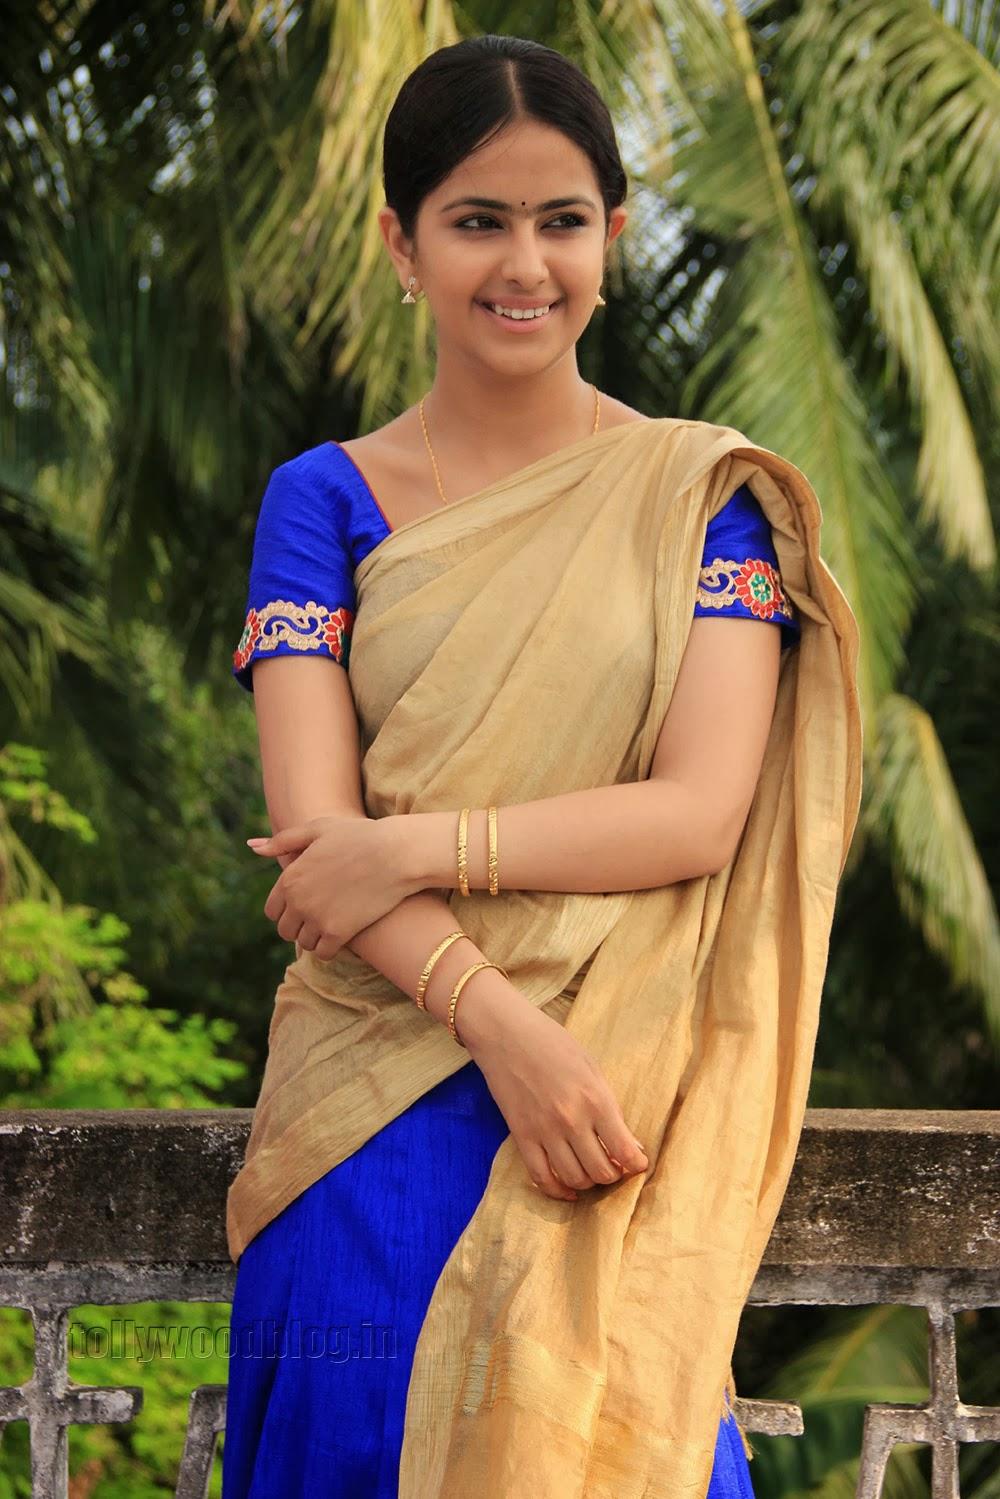 Avika Gaur in Super Cute Salwar Dress Stunning Smile Must See Pics